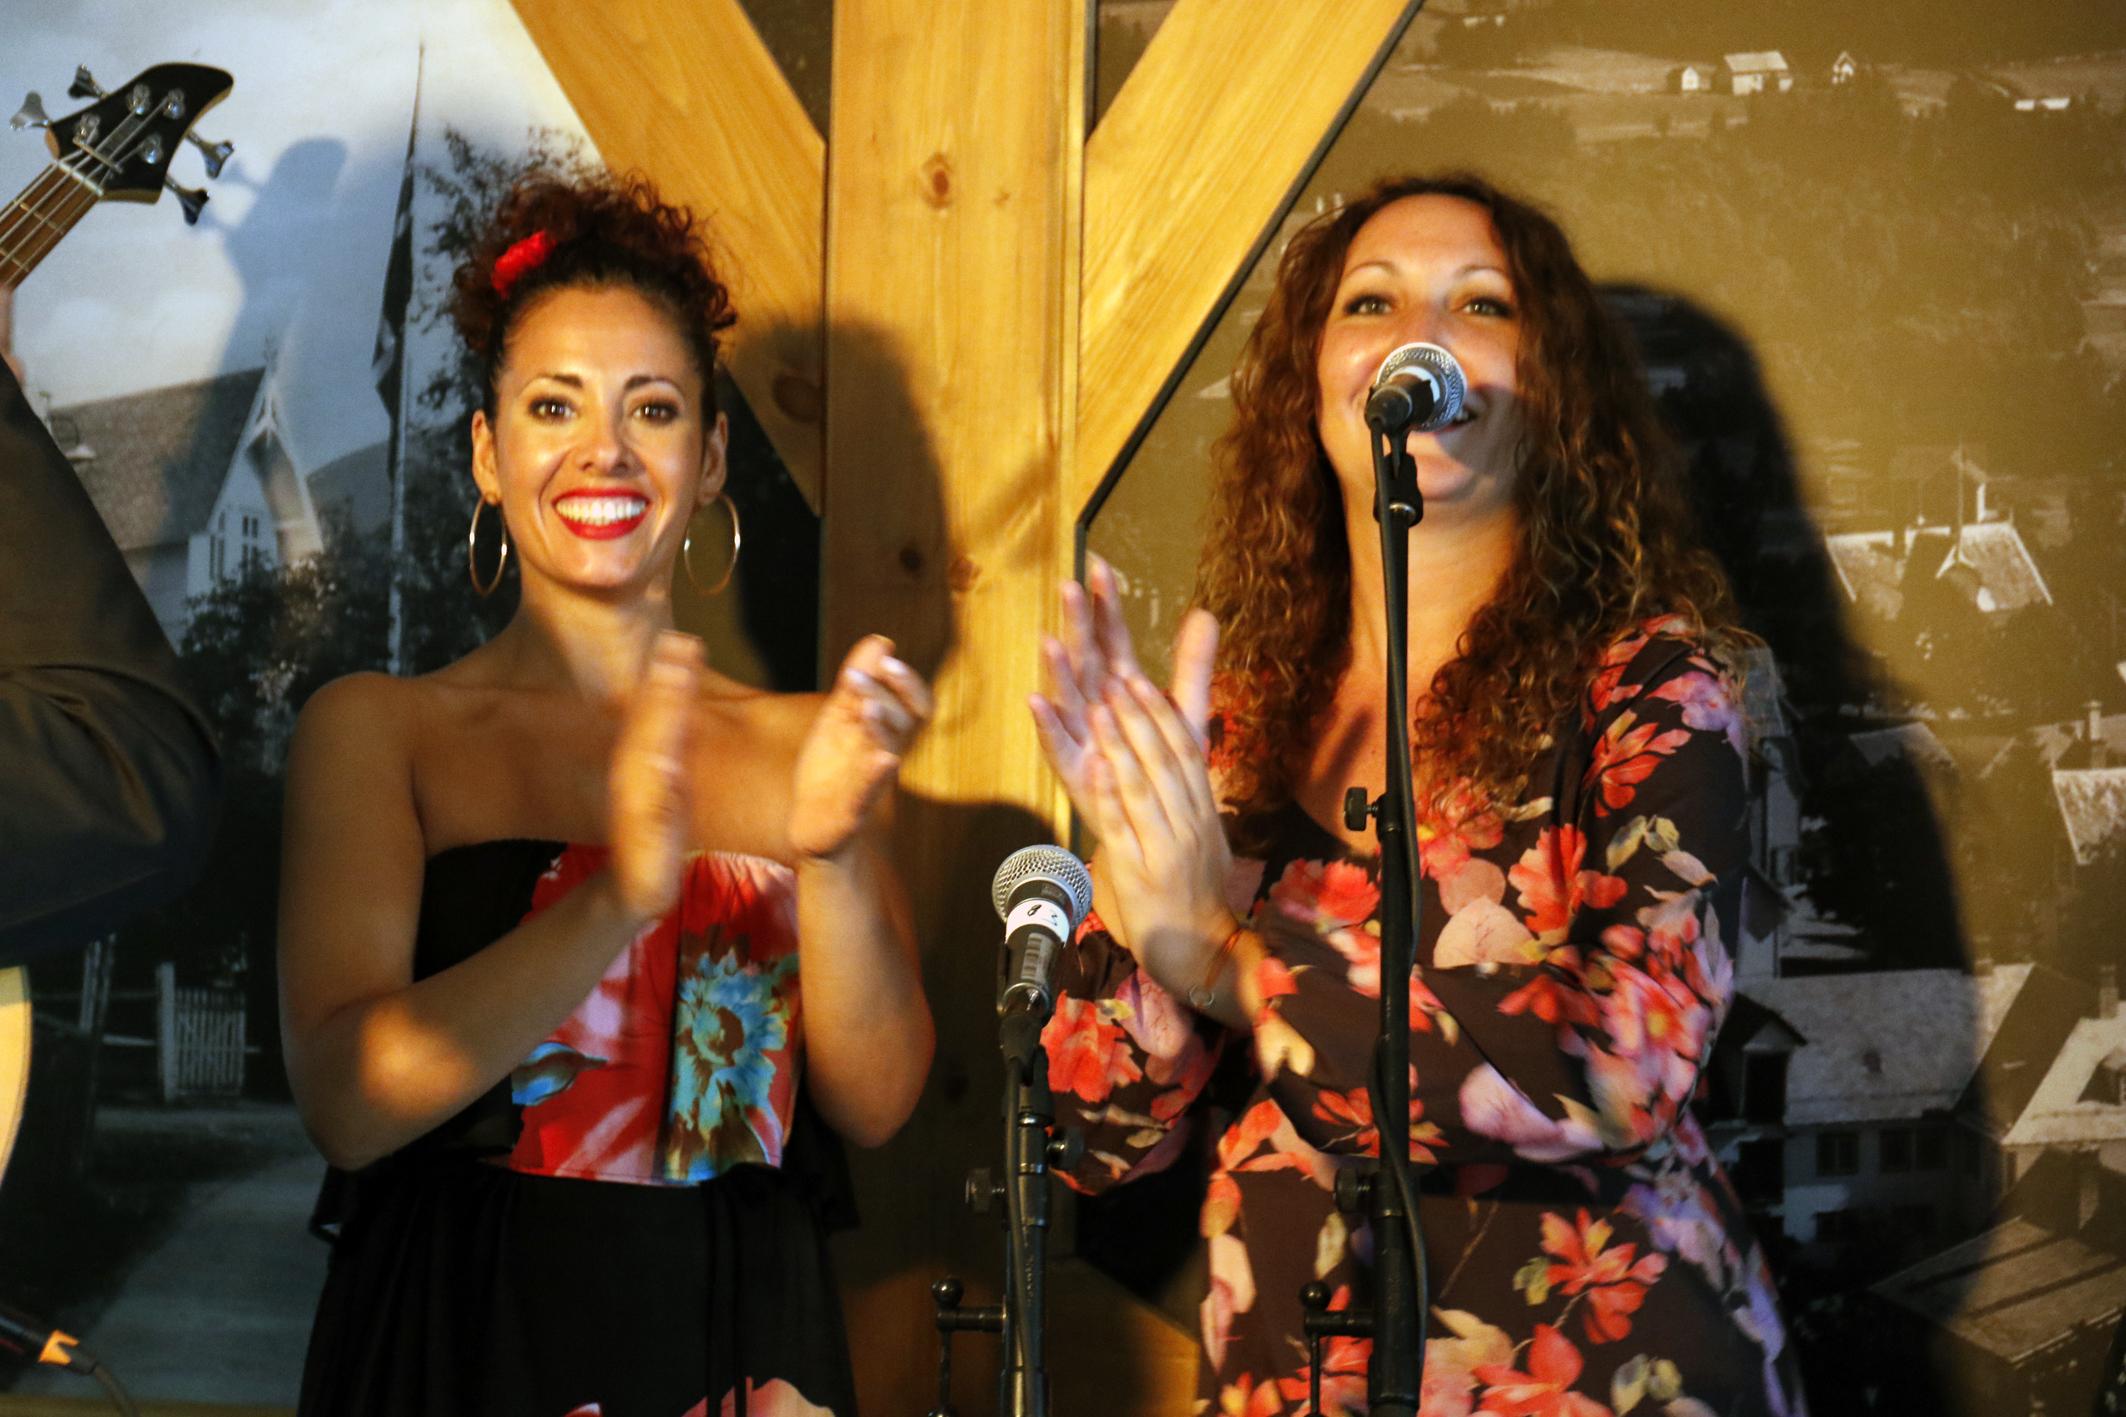 Raquel Vicente (som held dansekurs i Rumba Catalana på fredag) og Alba Bioque er nokre råskinn på 'palmas' (Foto: Geir Birkeland)